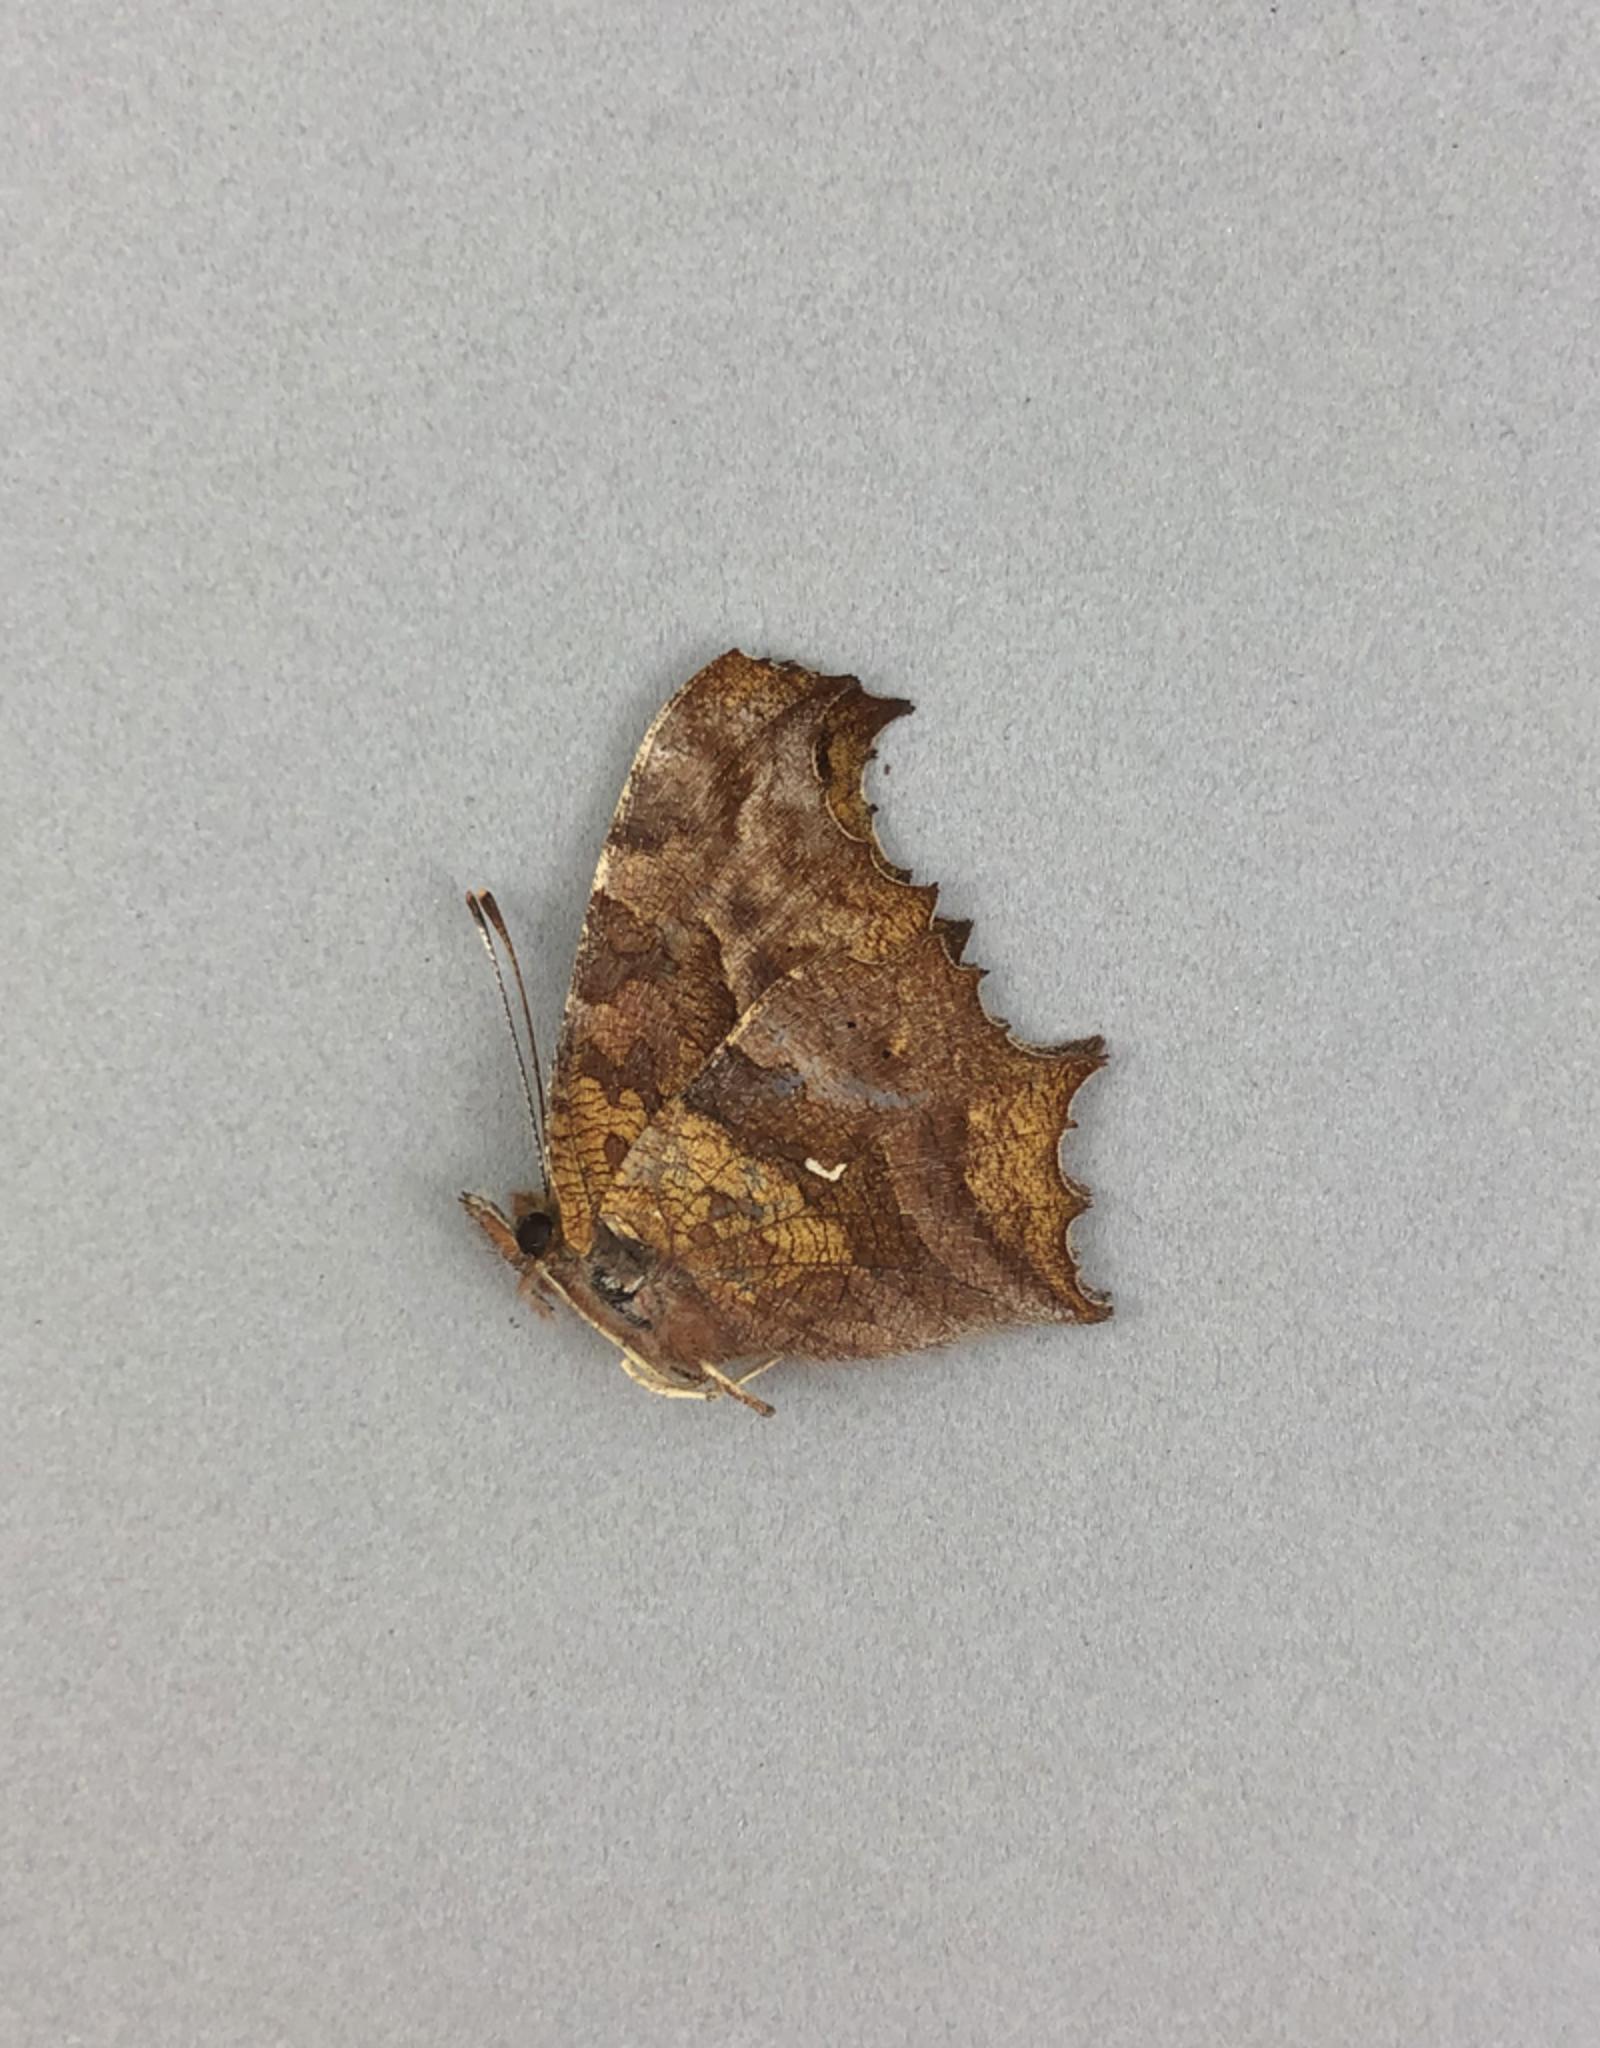 Polygonia c-aureum F A1 South Korea